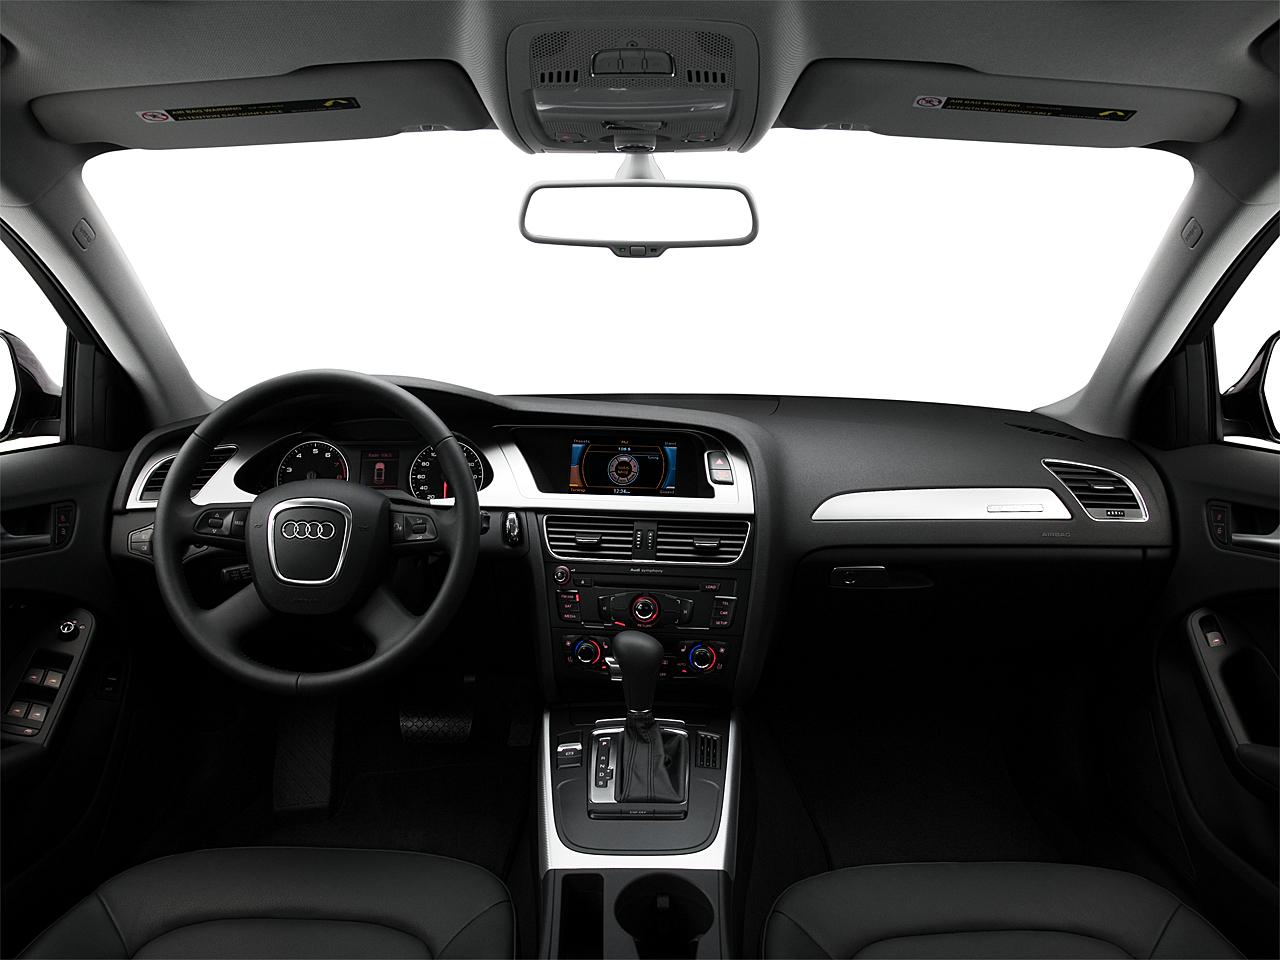 2009 audi a4 awd 2 0t quattro premium 4dr sedan 6m research groovecar. Black Bedroom Furniture Sets. Home Design Ideas